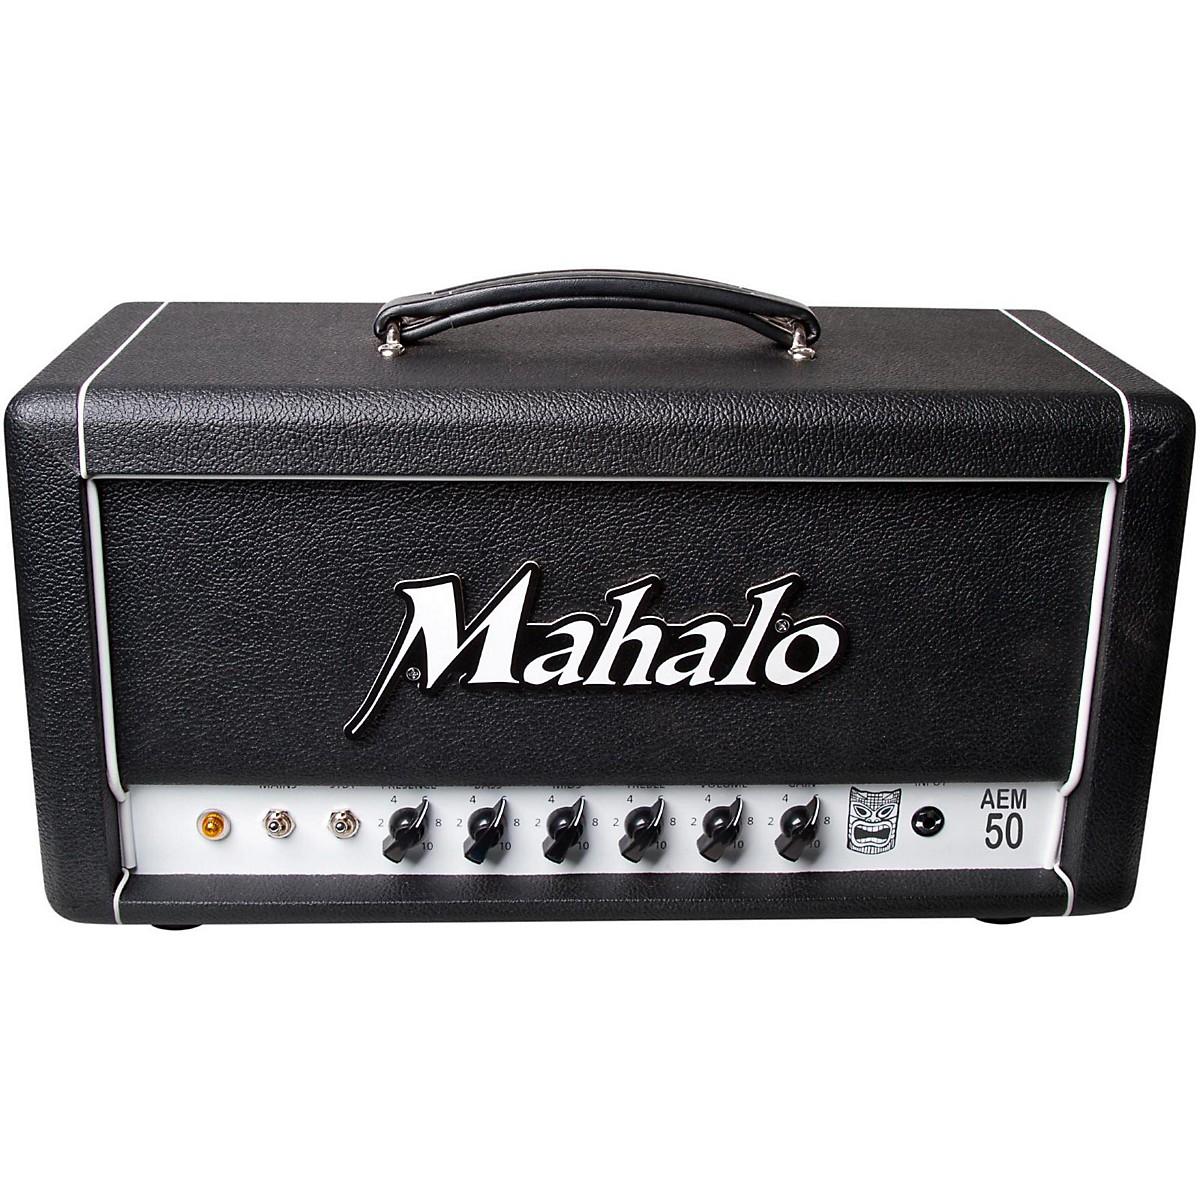 Mahalo AEM50 45W Guitar Tube Head